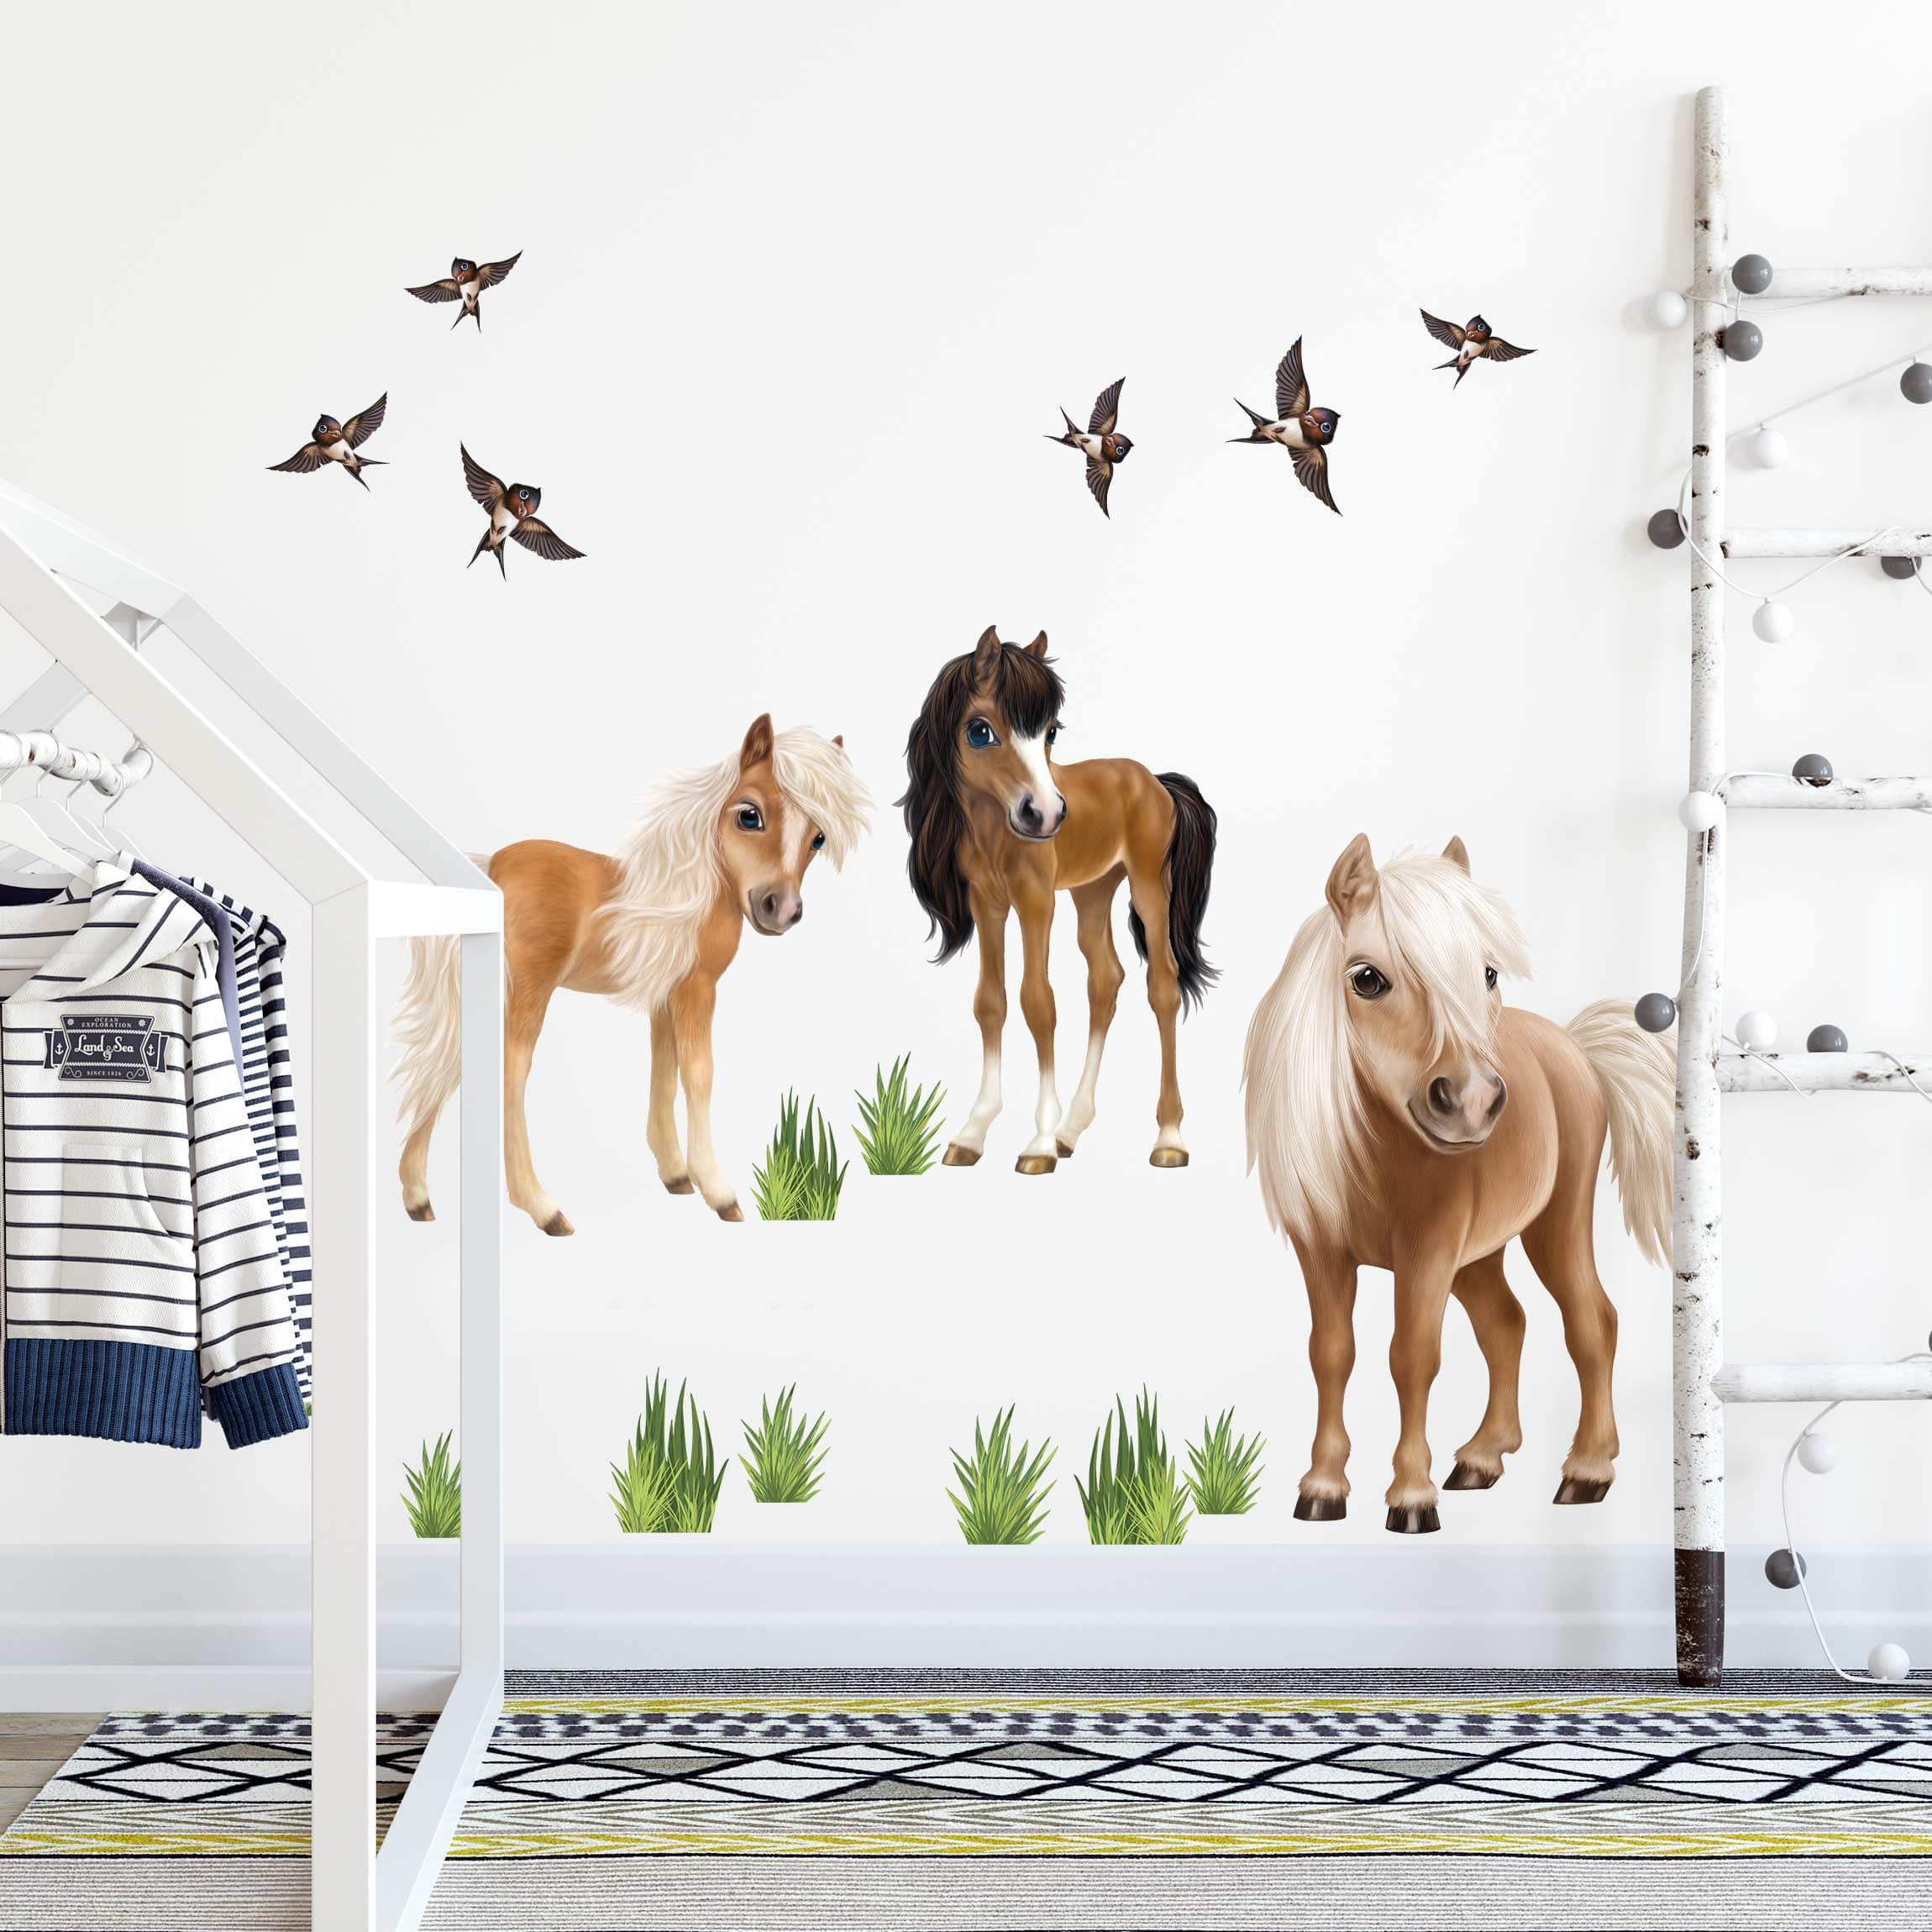 Full Size of Kinderzimmer Pferd Wandtattoo Animal Club International Set Pferde Regal Sofa Regale Weiß Kinderzimmer Kinderzimmer Pferd